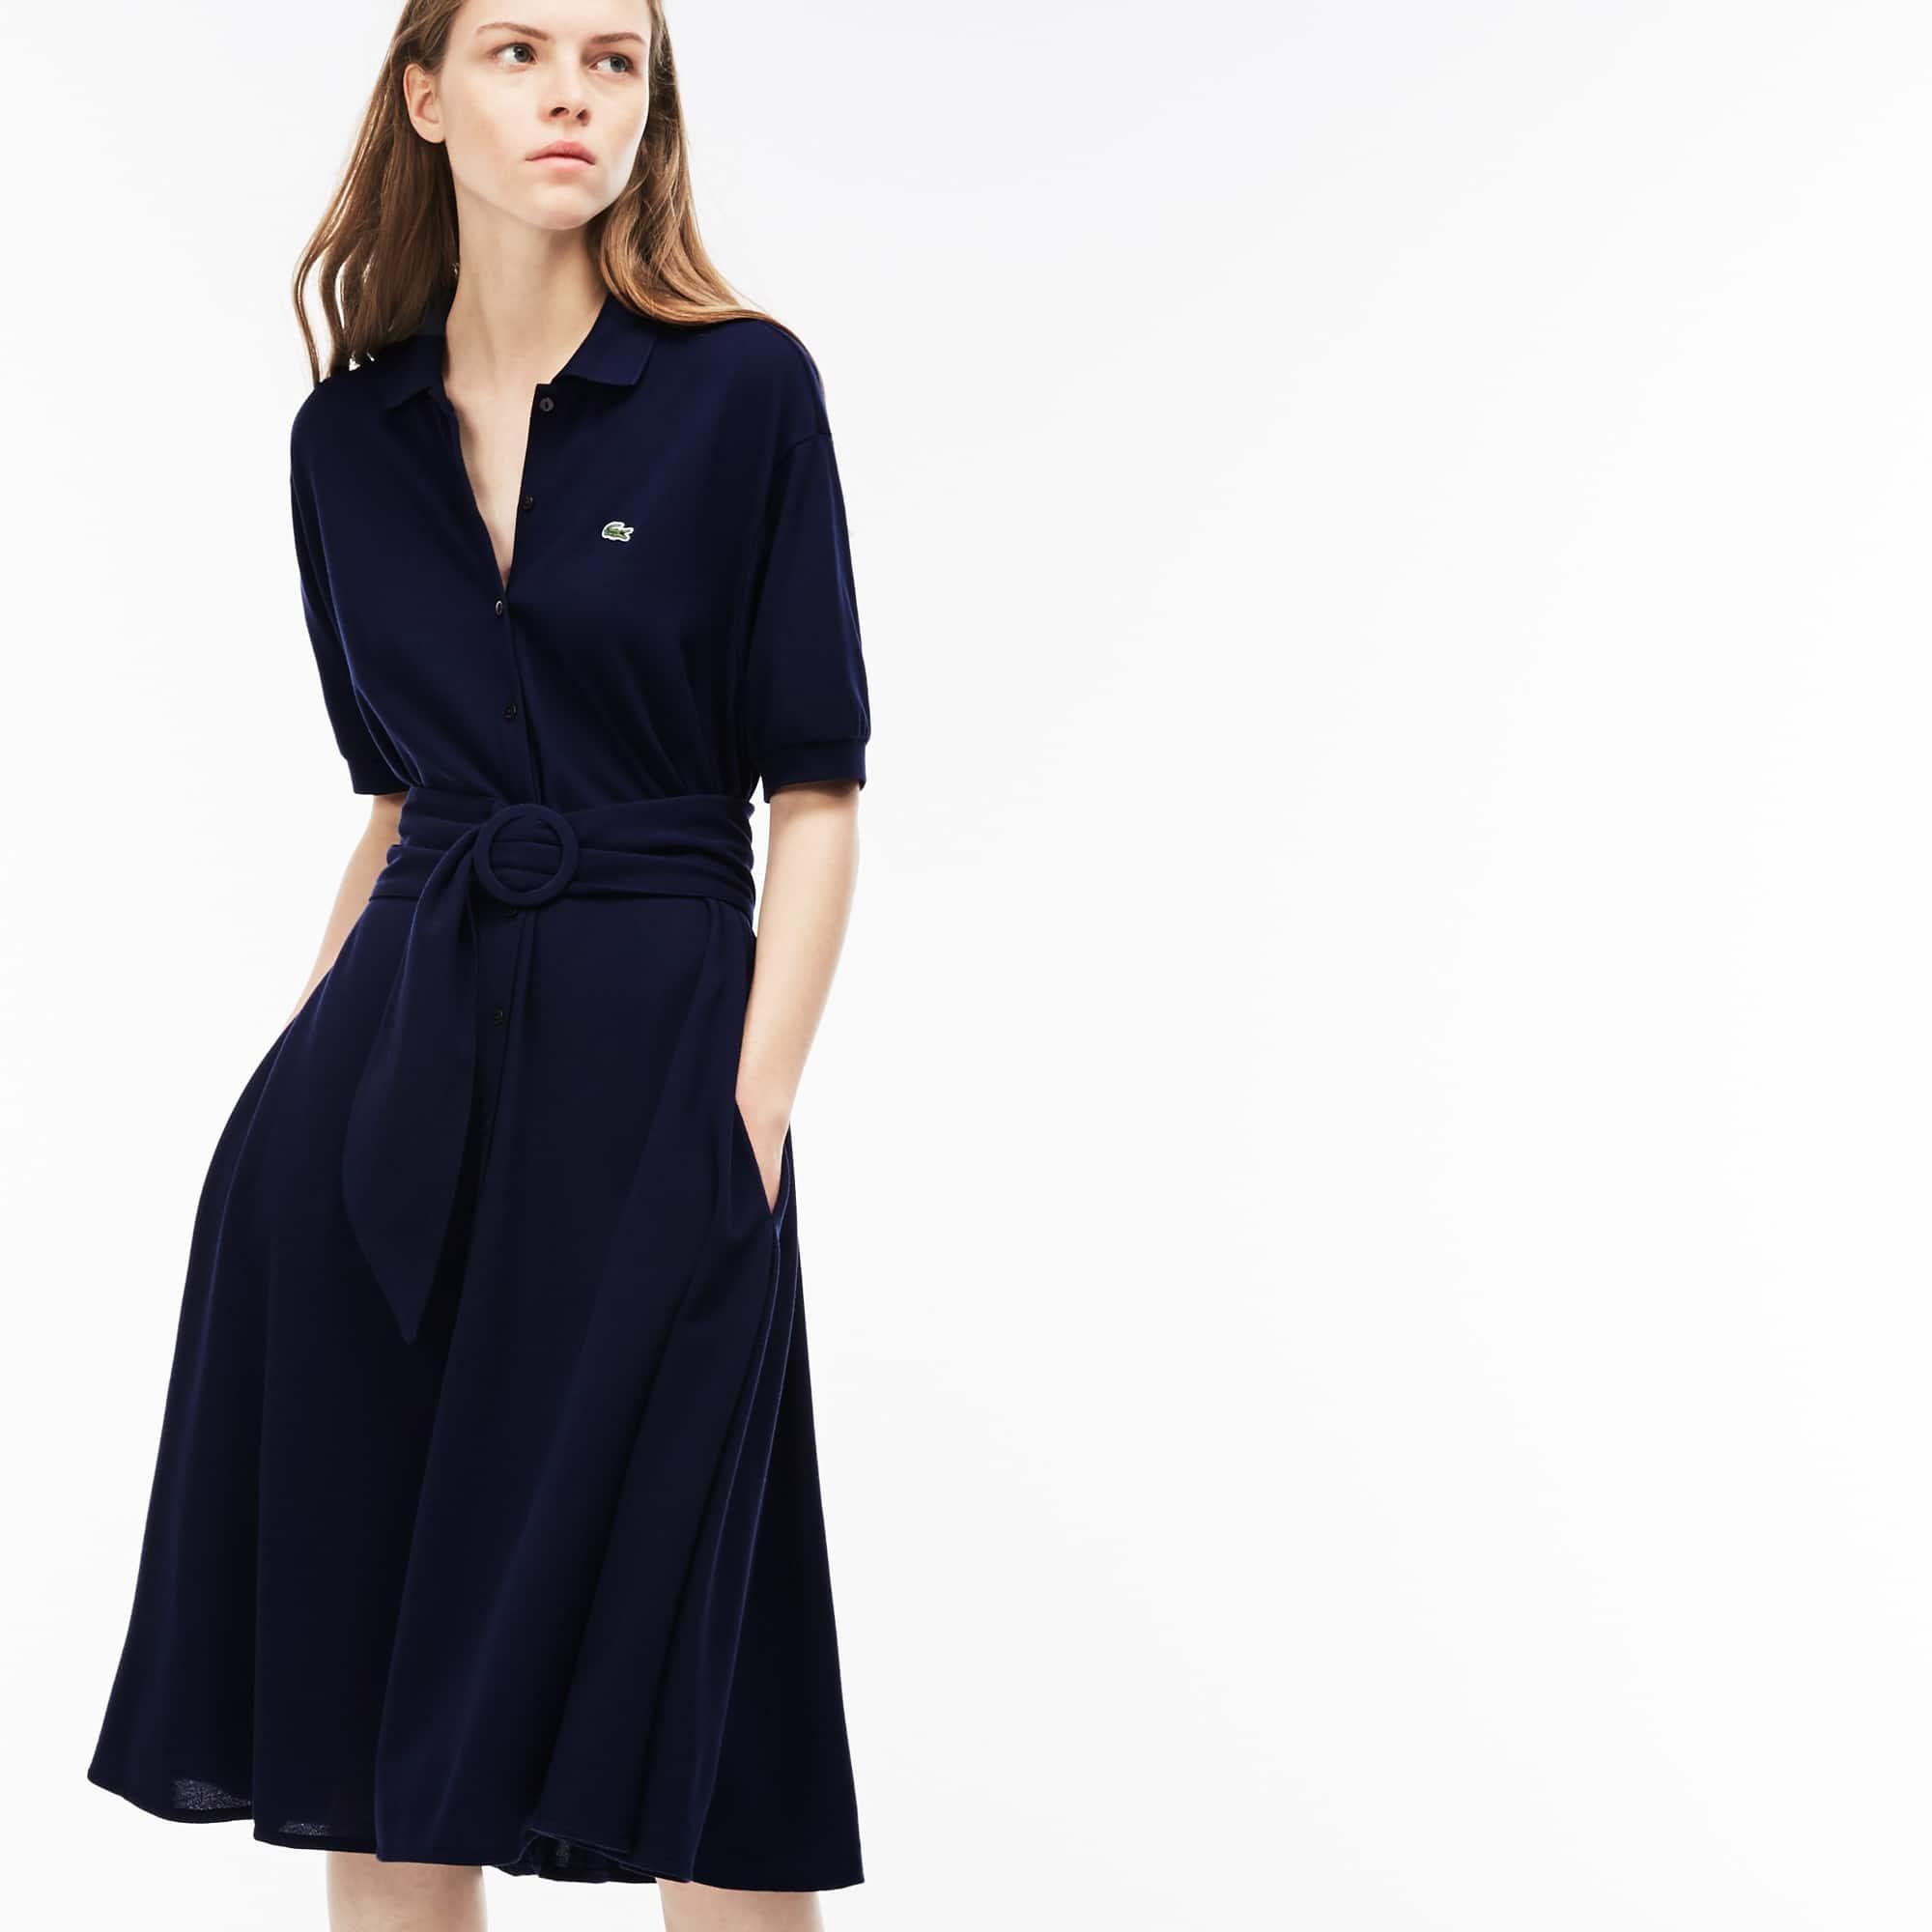 Robe polo bleu marine lacoste